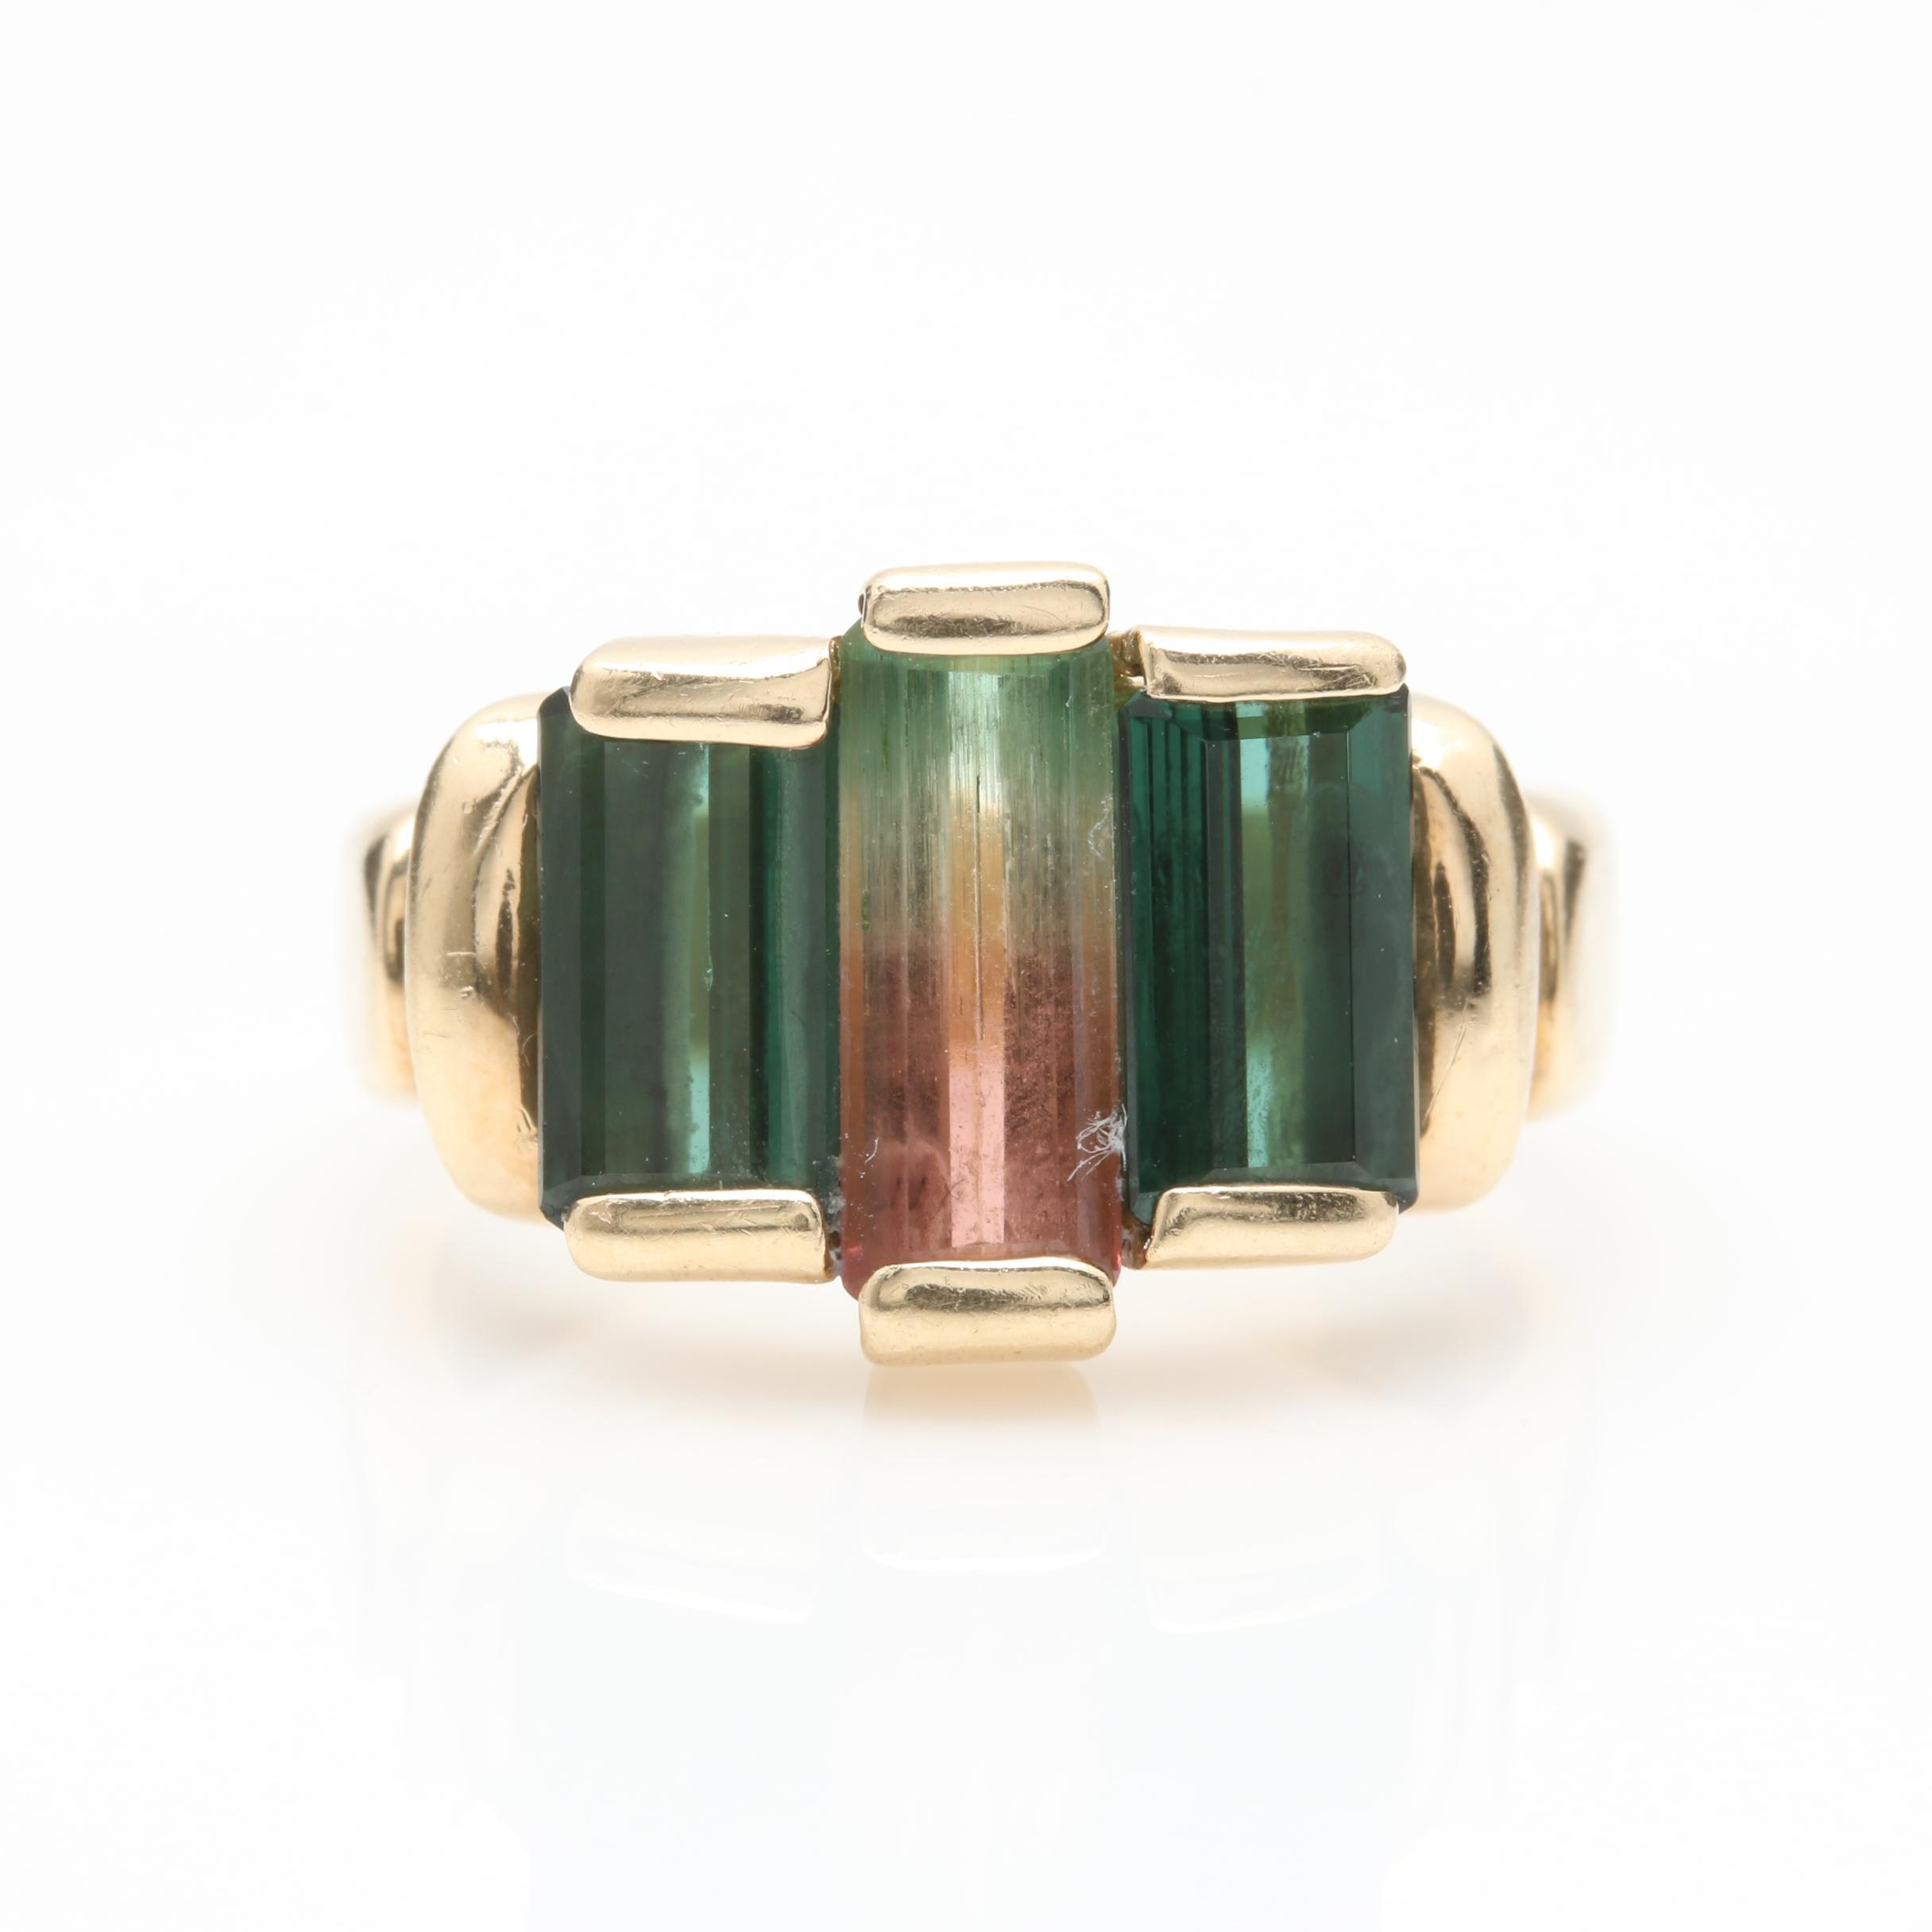 14K Yellow Gold Bi-Color Tourmaline and Green Tourmaline Ring